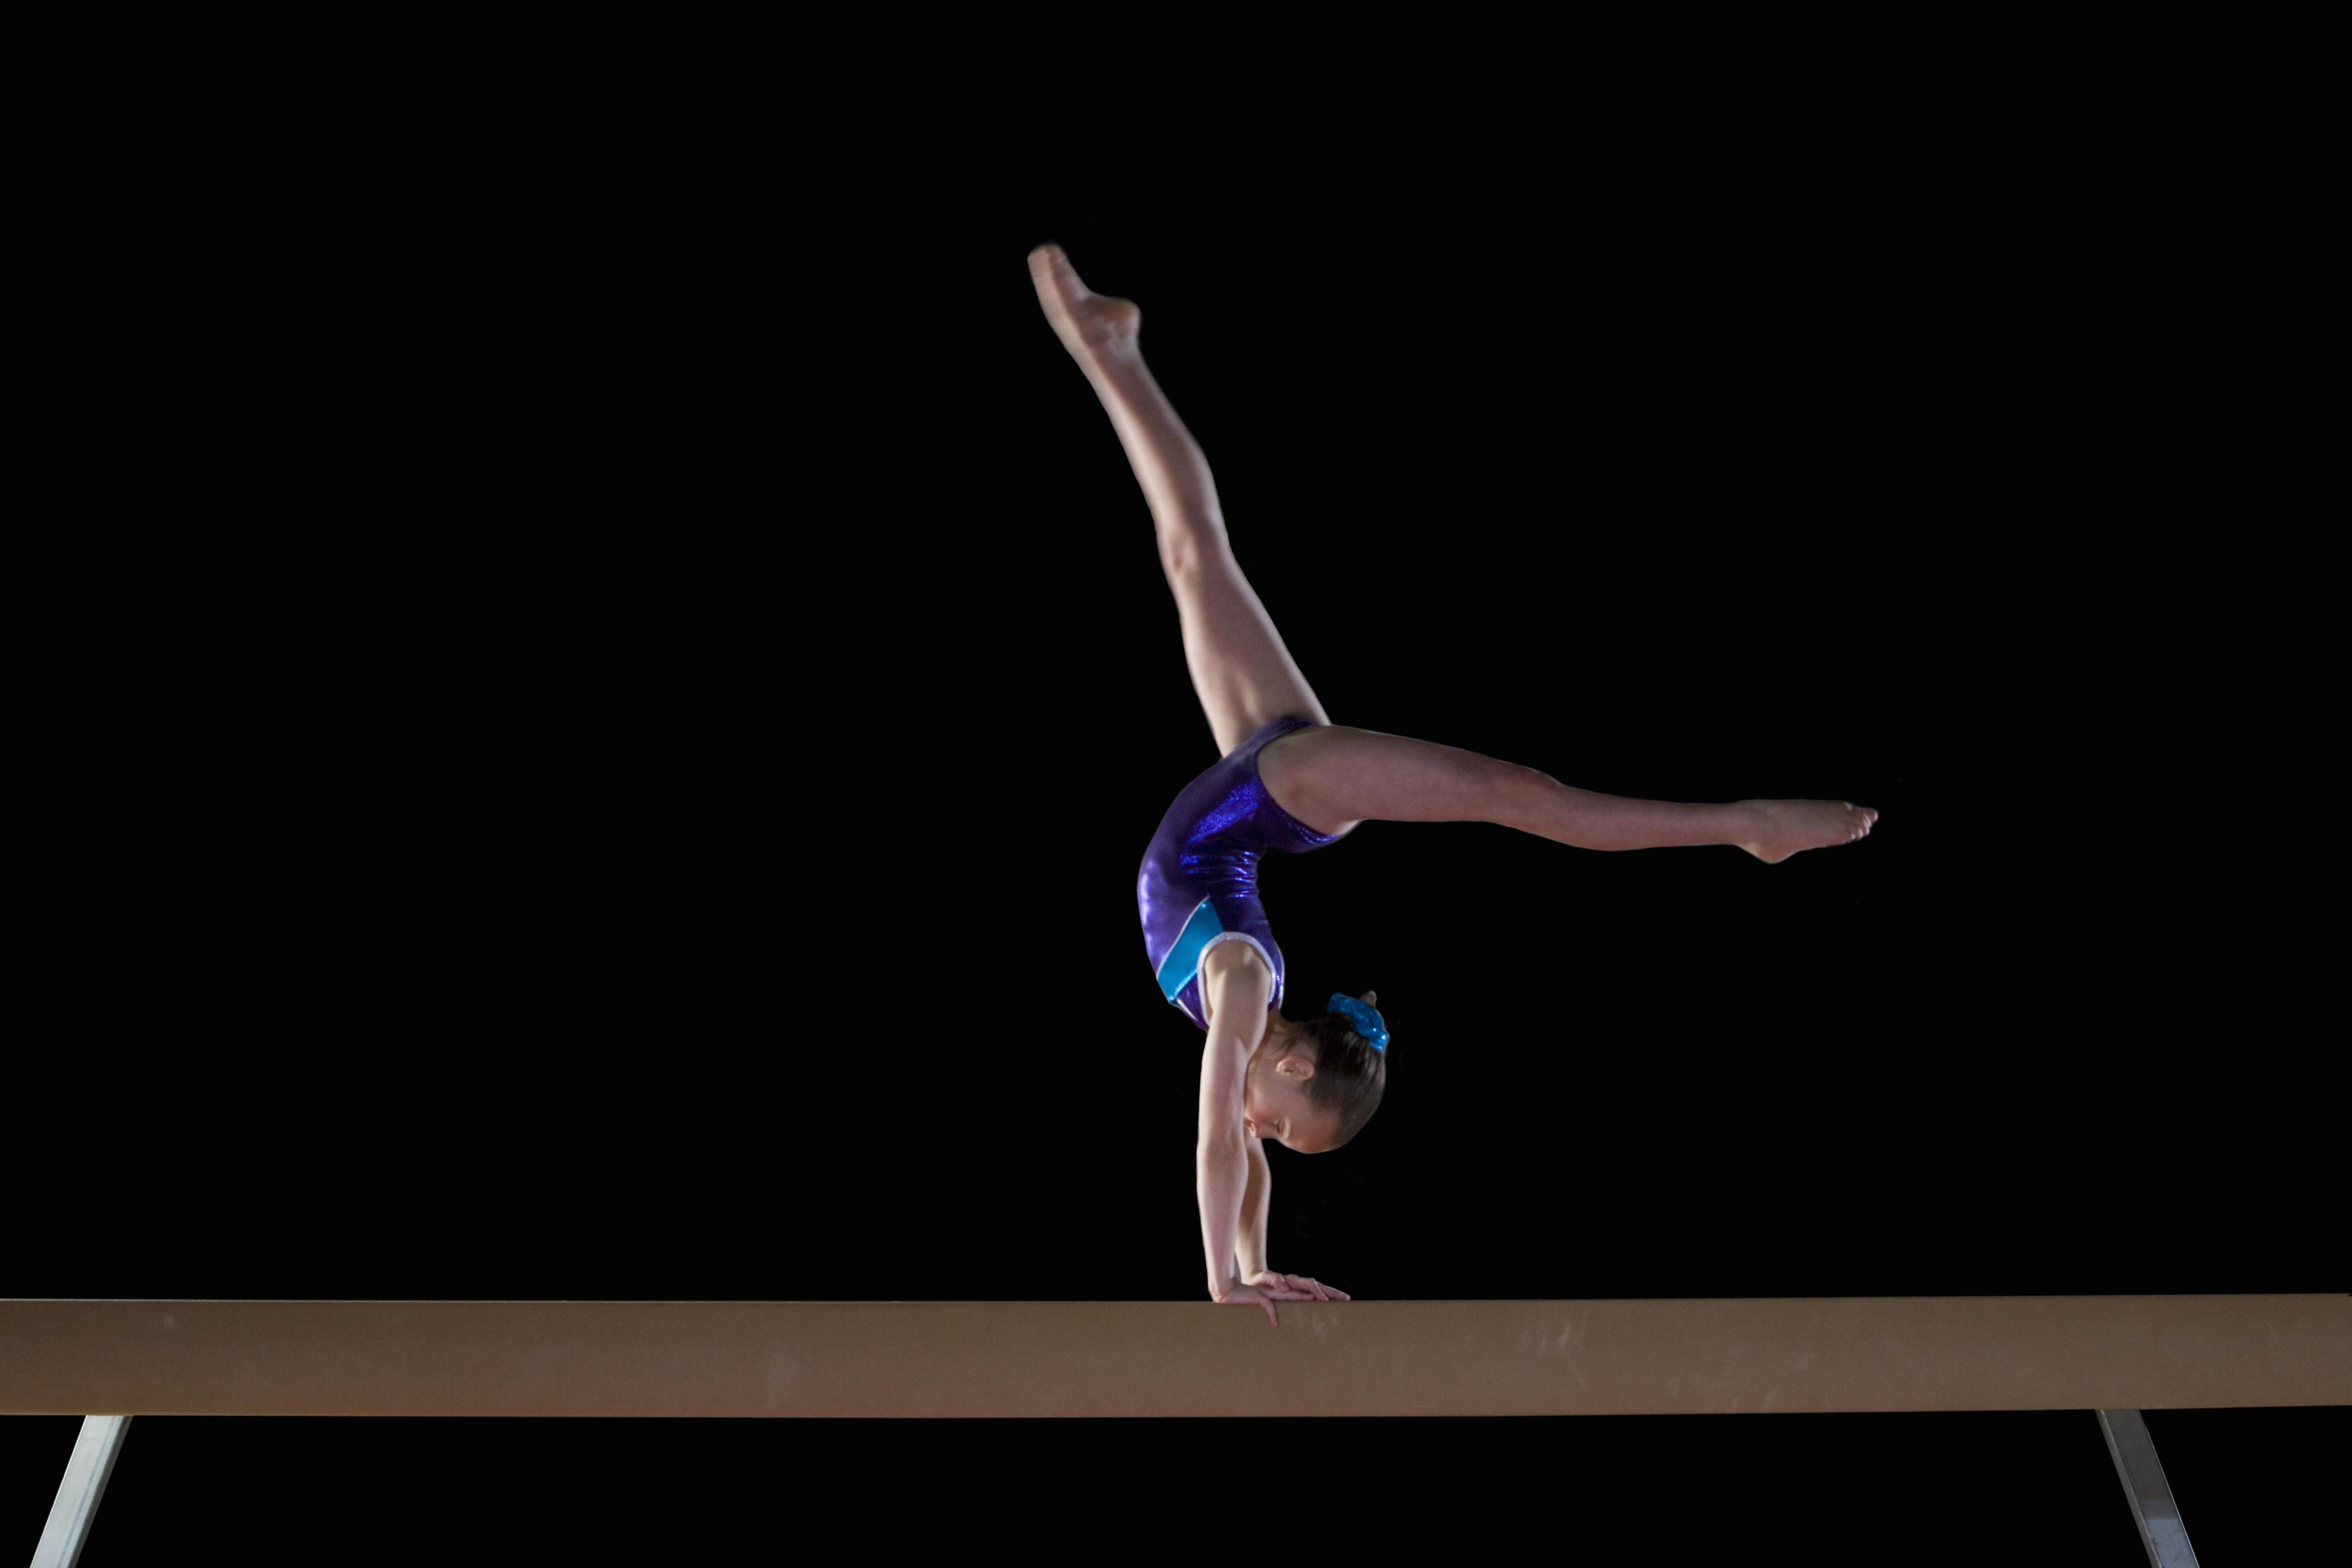 Gymnast pic photos 53